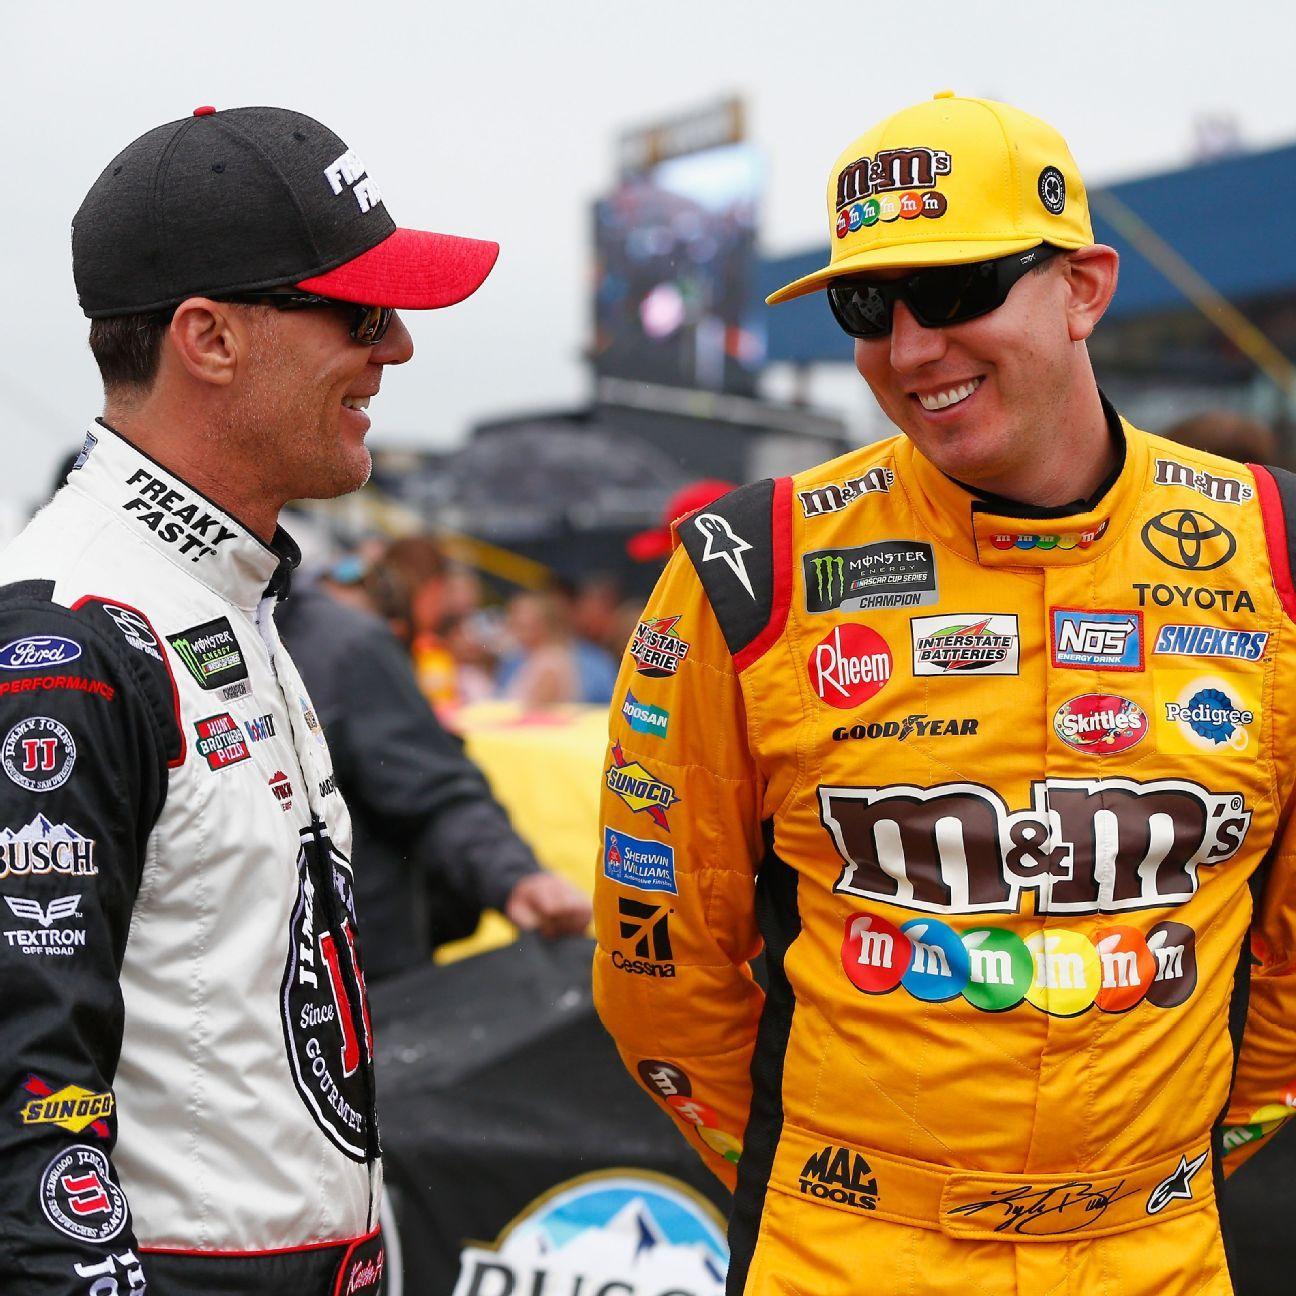 Denny Hamlin leaves best pit stall to JGR teammate Kyle Busch